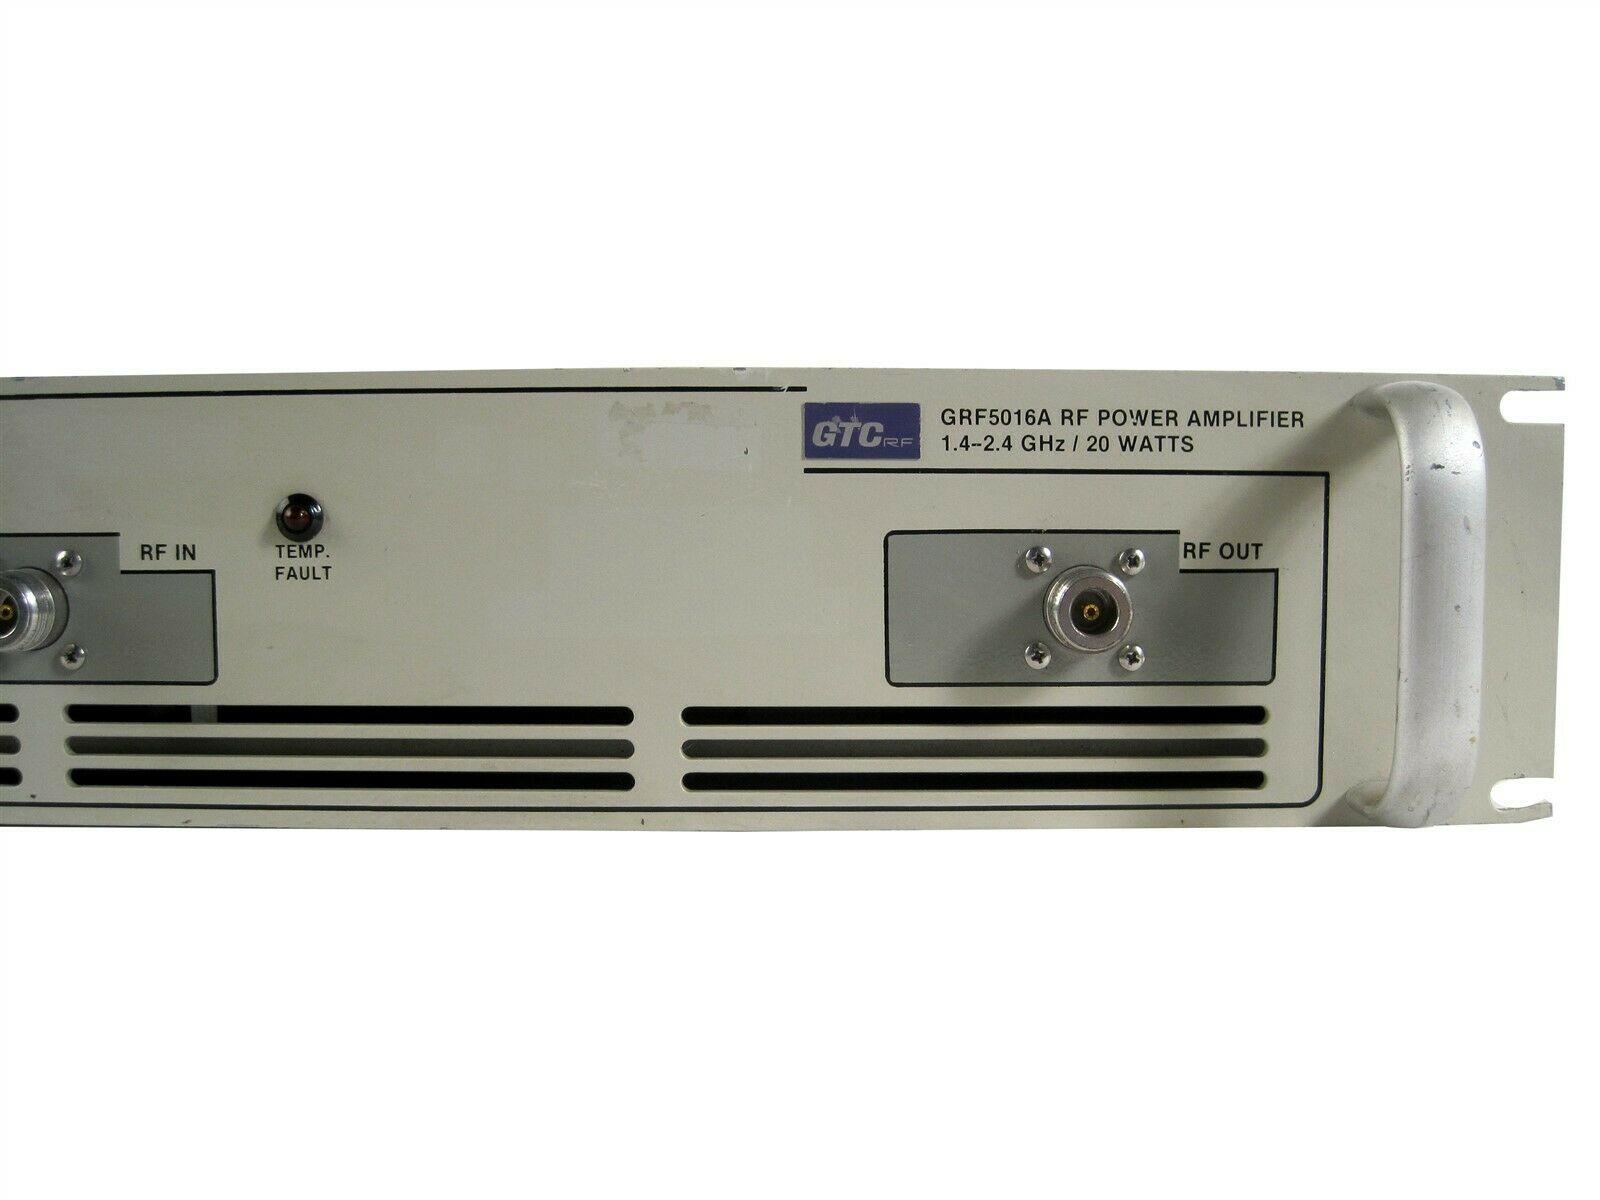 Details about GTC CORPORATION GRF5016A LINEAR RF POWER AMPLIFIER  1 4GHZ-2 4GHZ / 20 WATTS